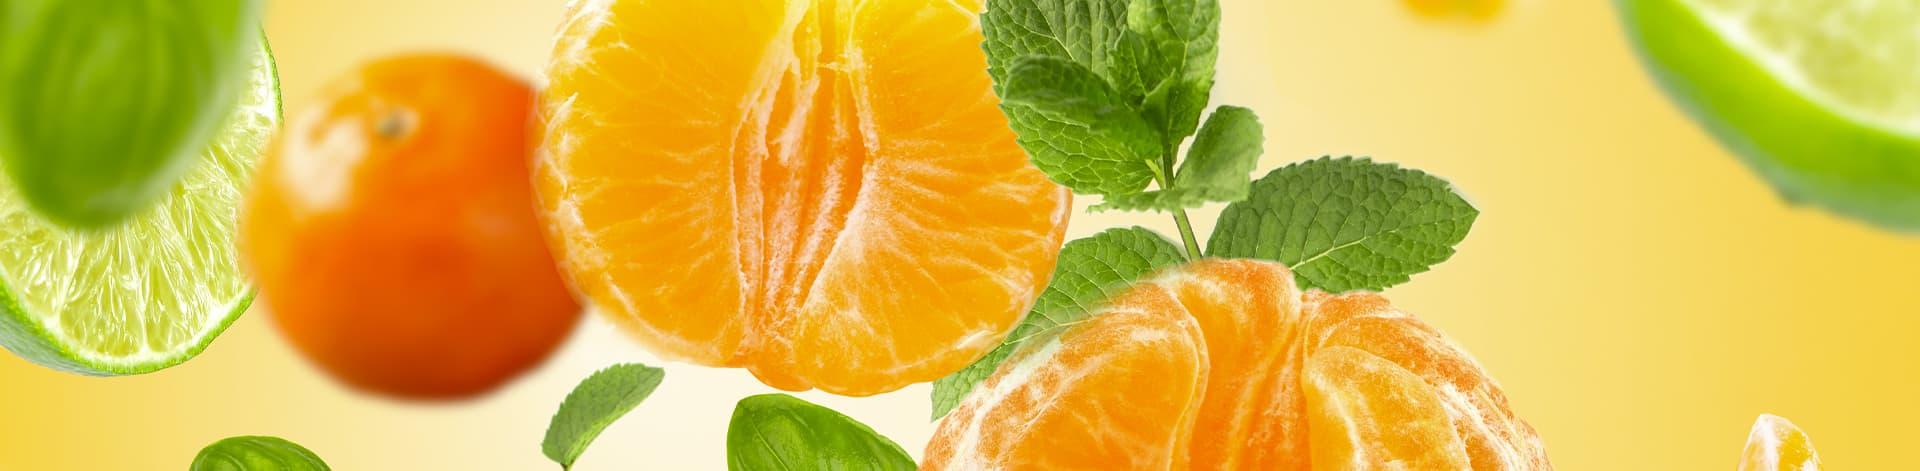 Bannière Mandarine Aromatique